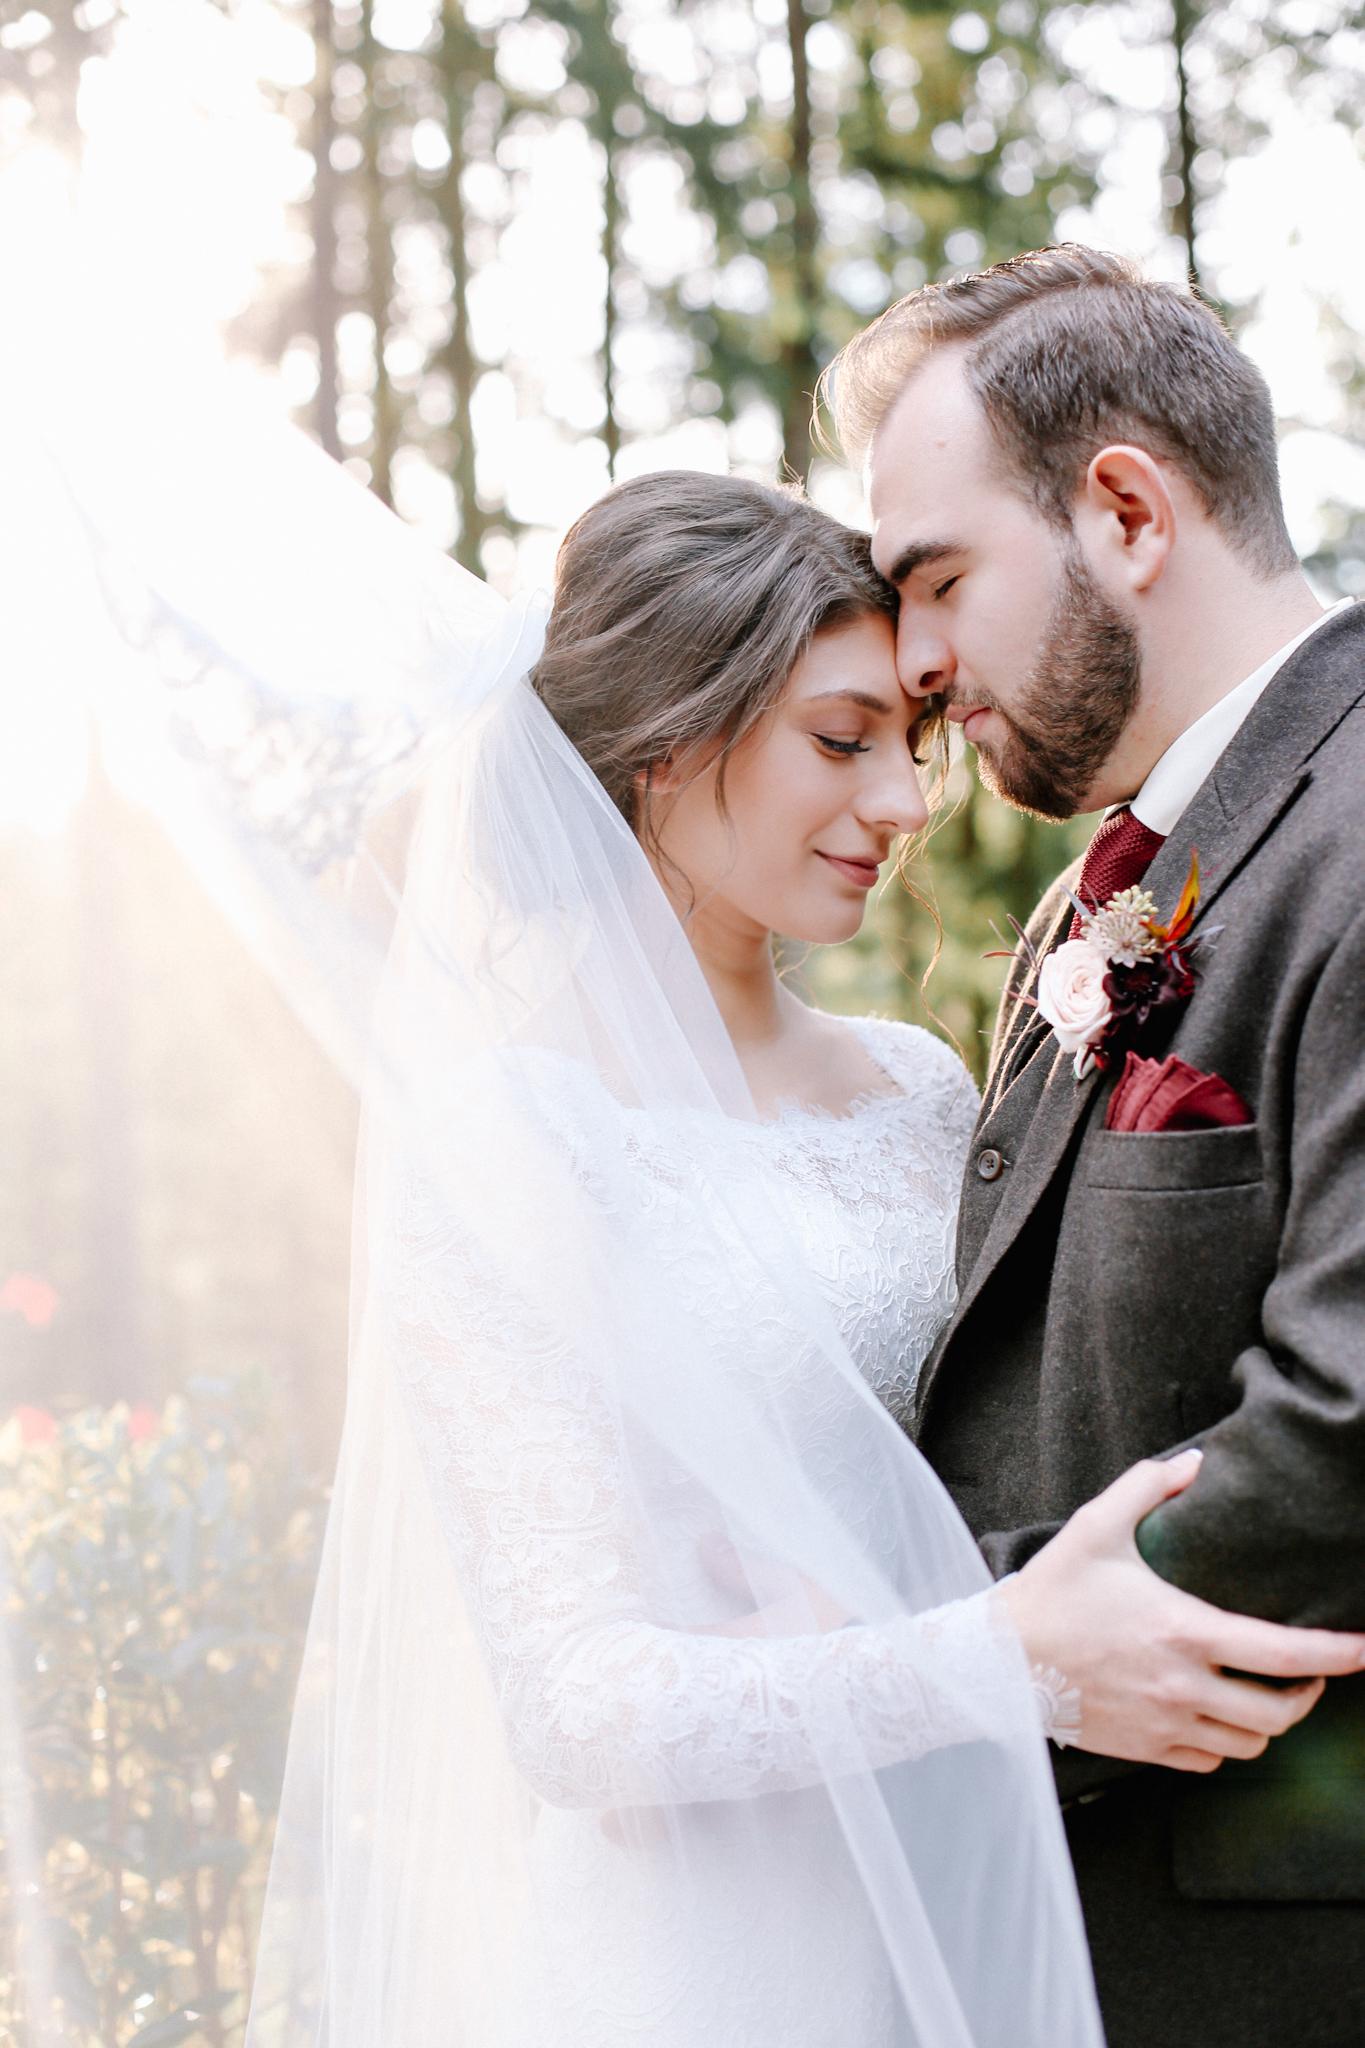 Manu and Laura - Portland Wedding Photographer - 27.jpg